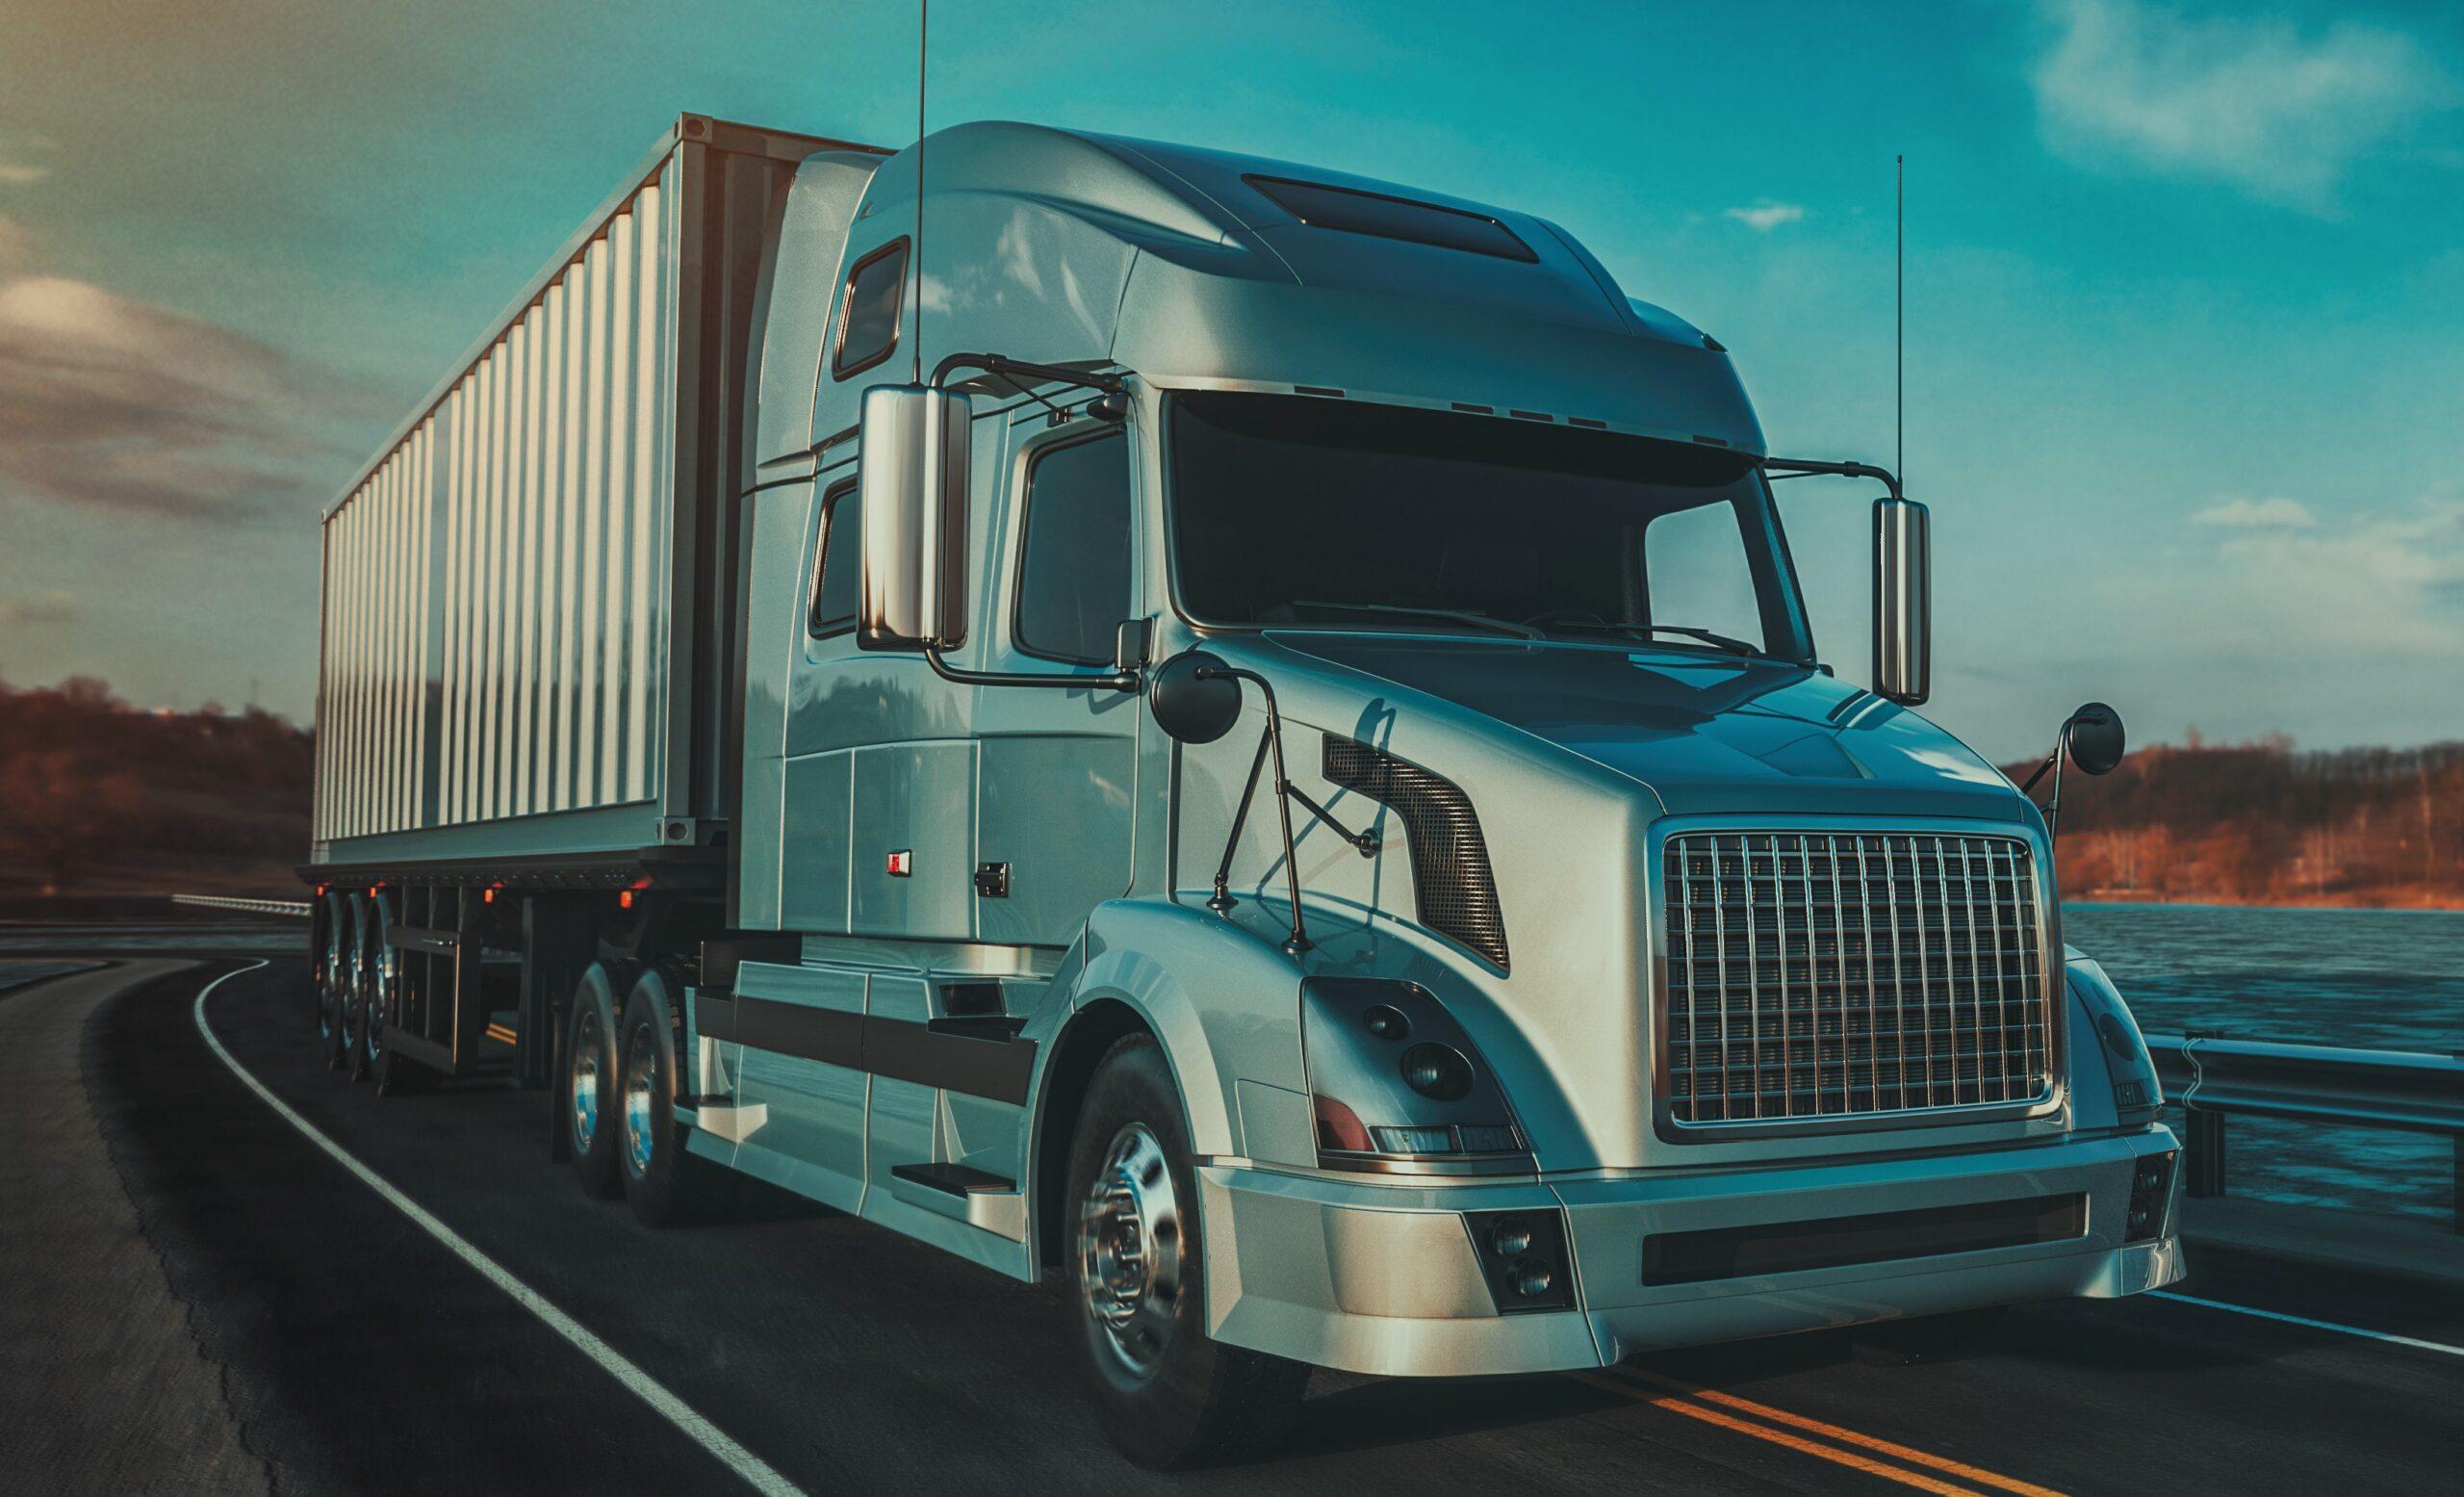 Truck Trucking miami florida insurance